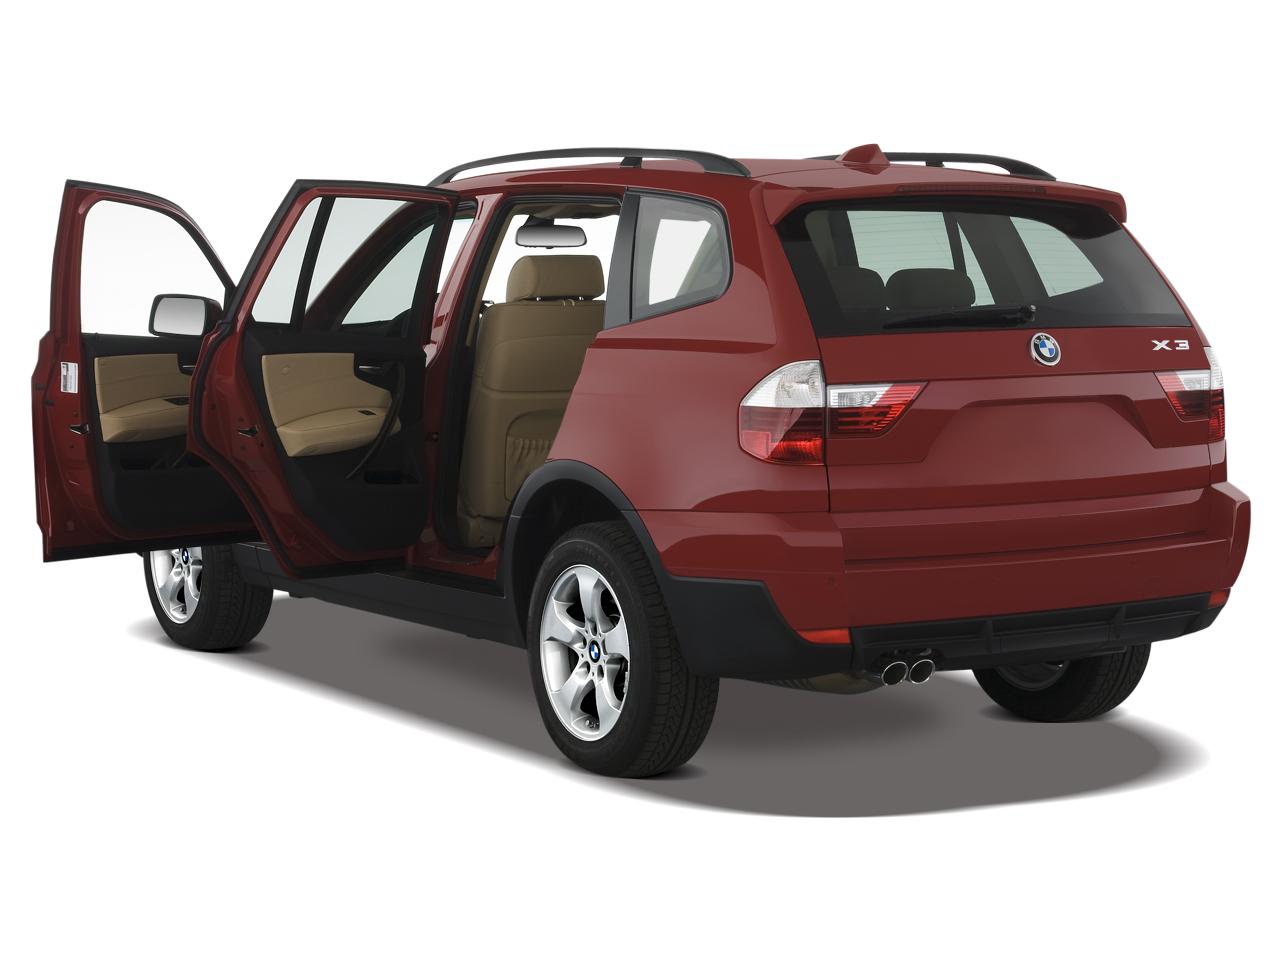 2008 BMW X3 Hybrid